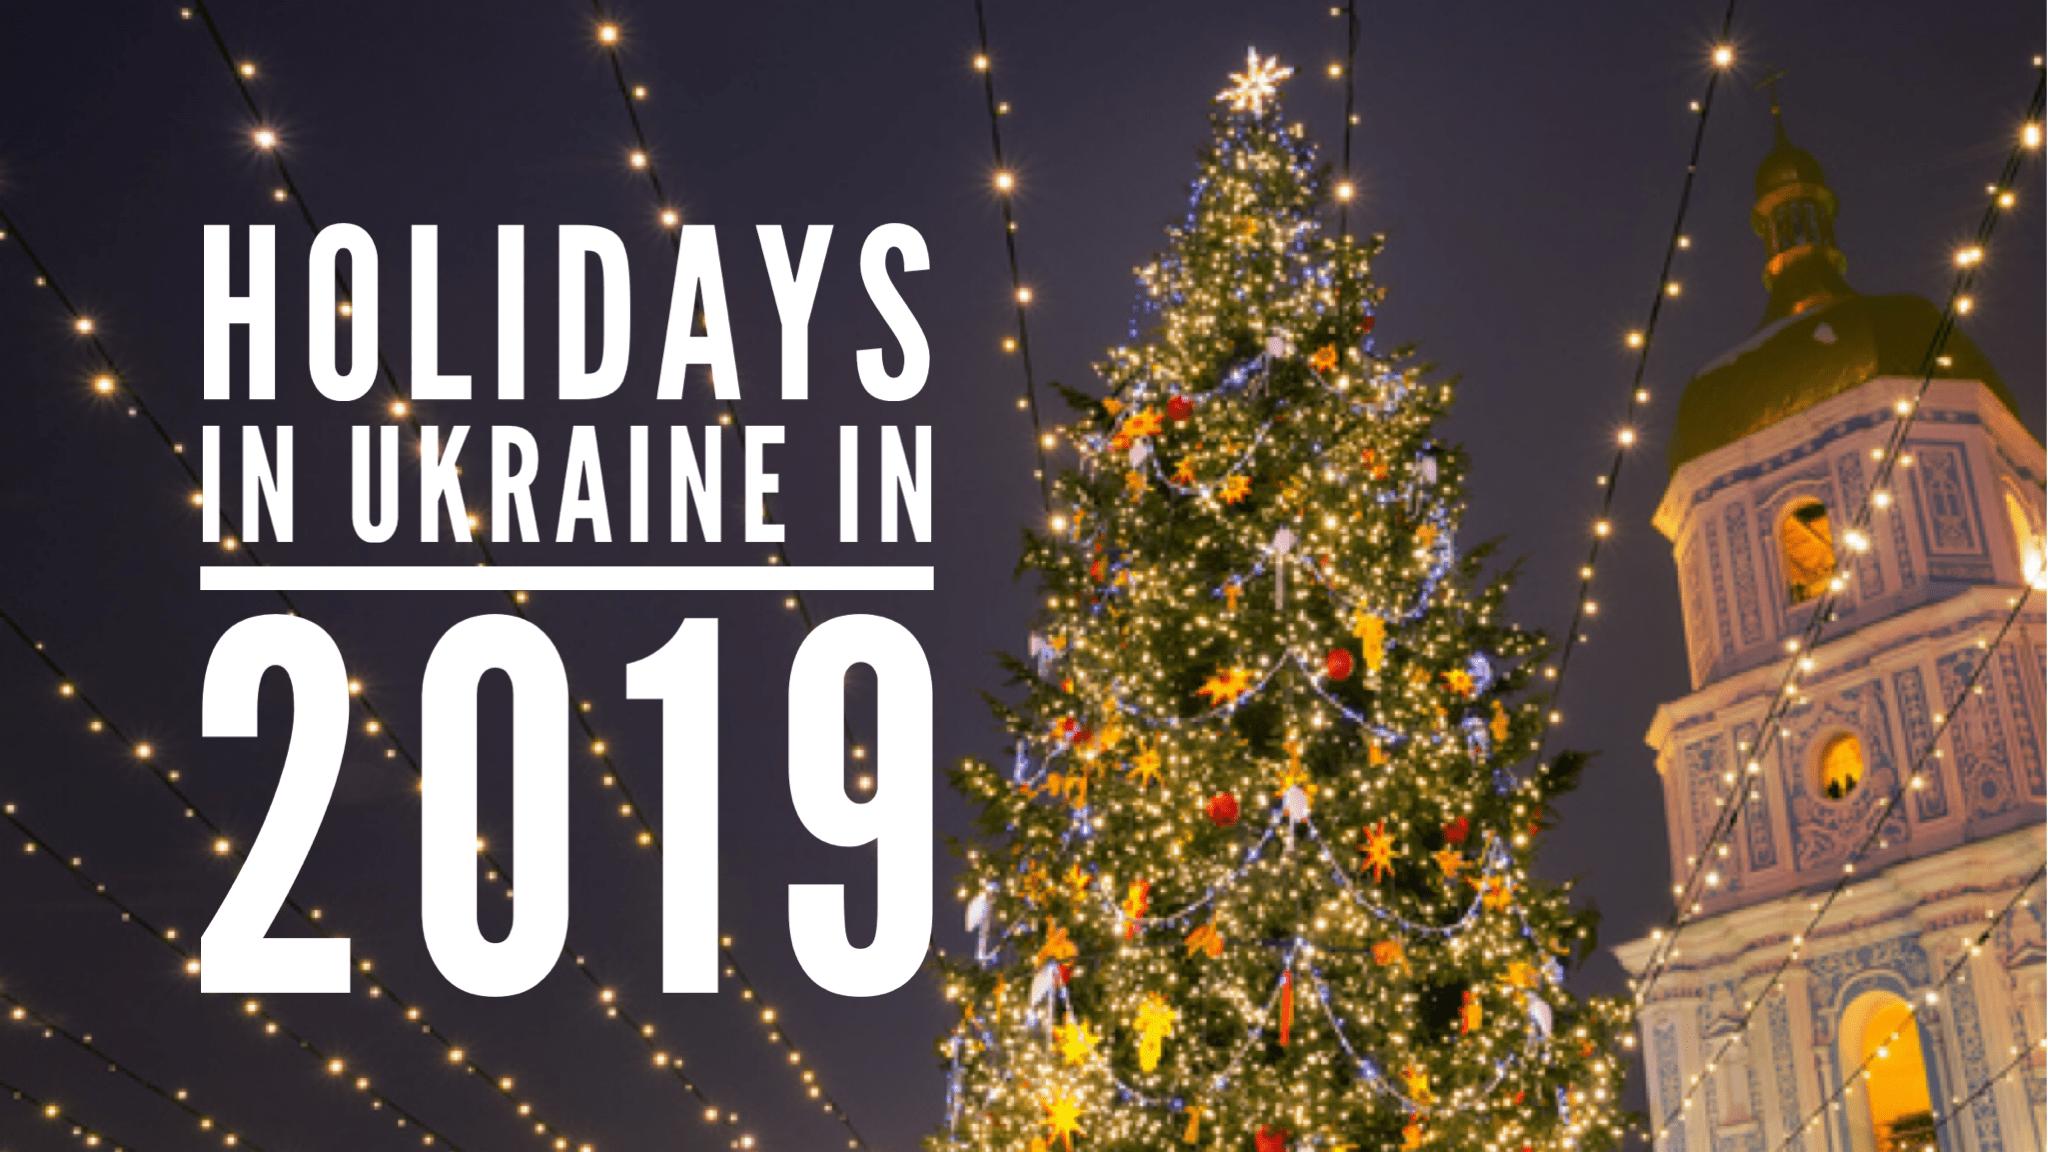 Christmas Eve Holiday 2019 Holidays in Ukraine in 2019 (in Ukrainian and English)   Ukrainian